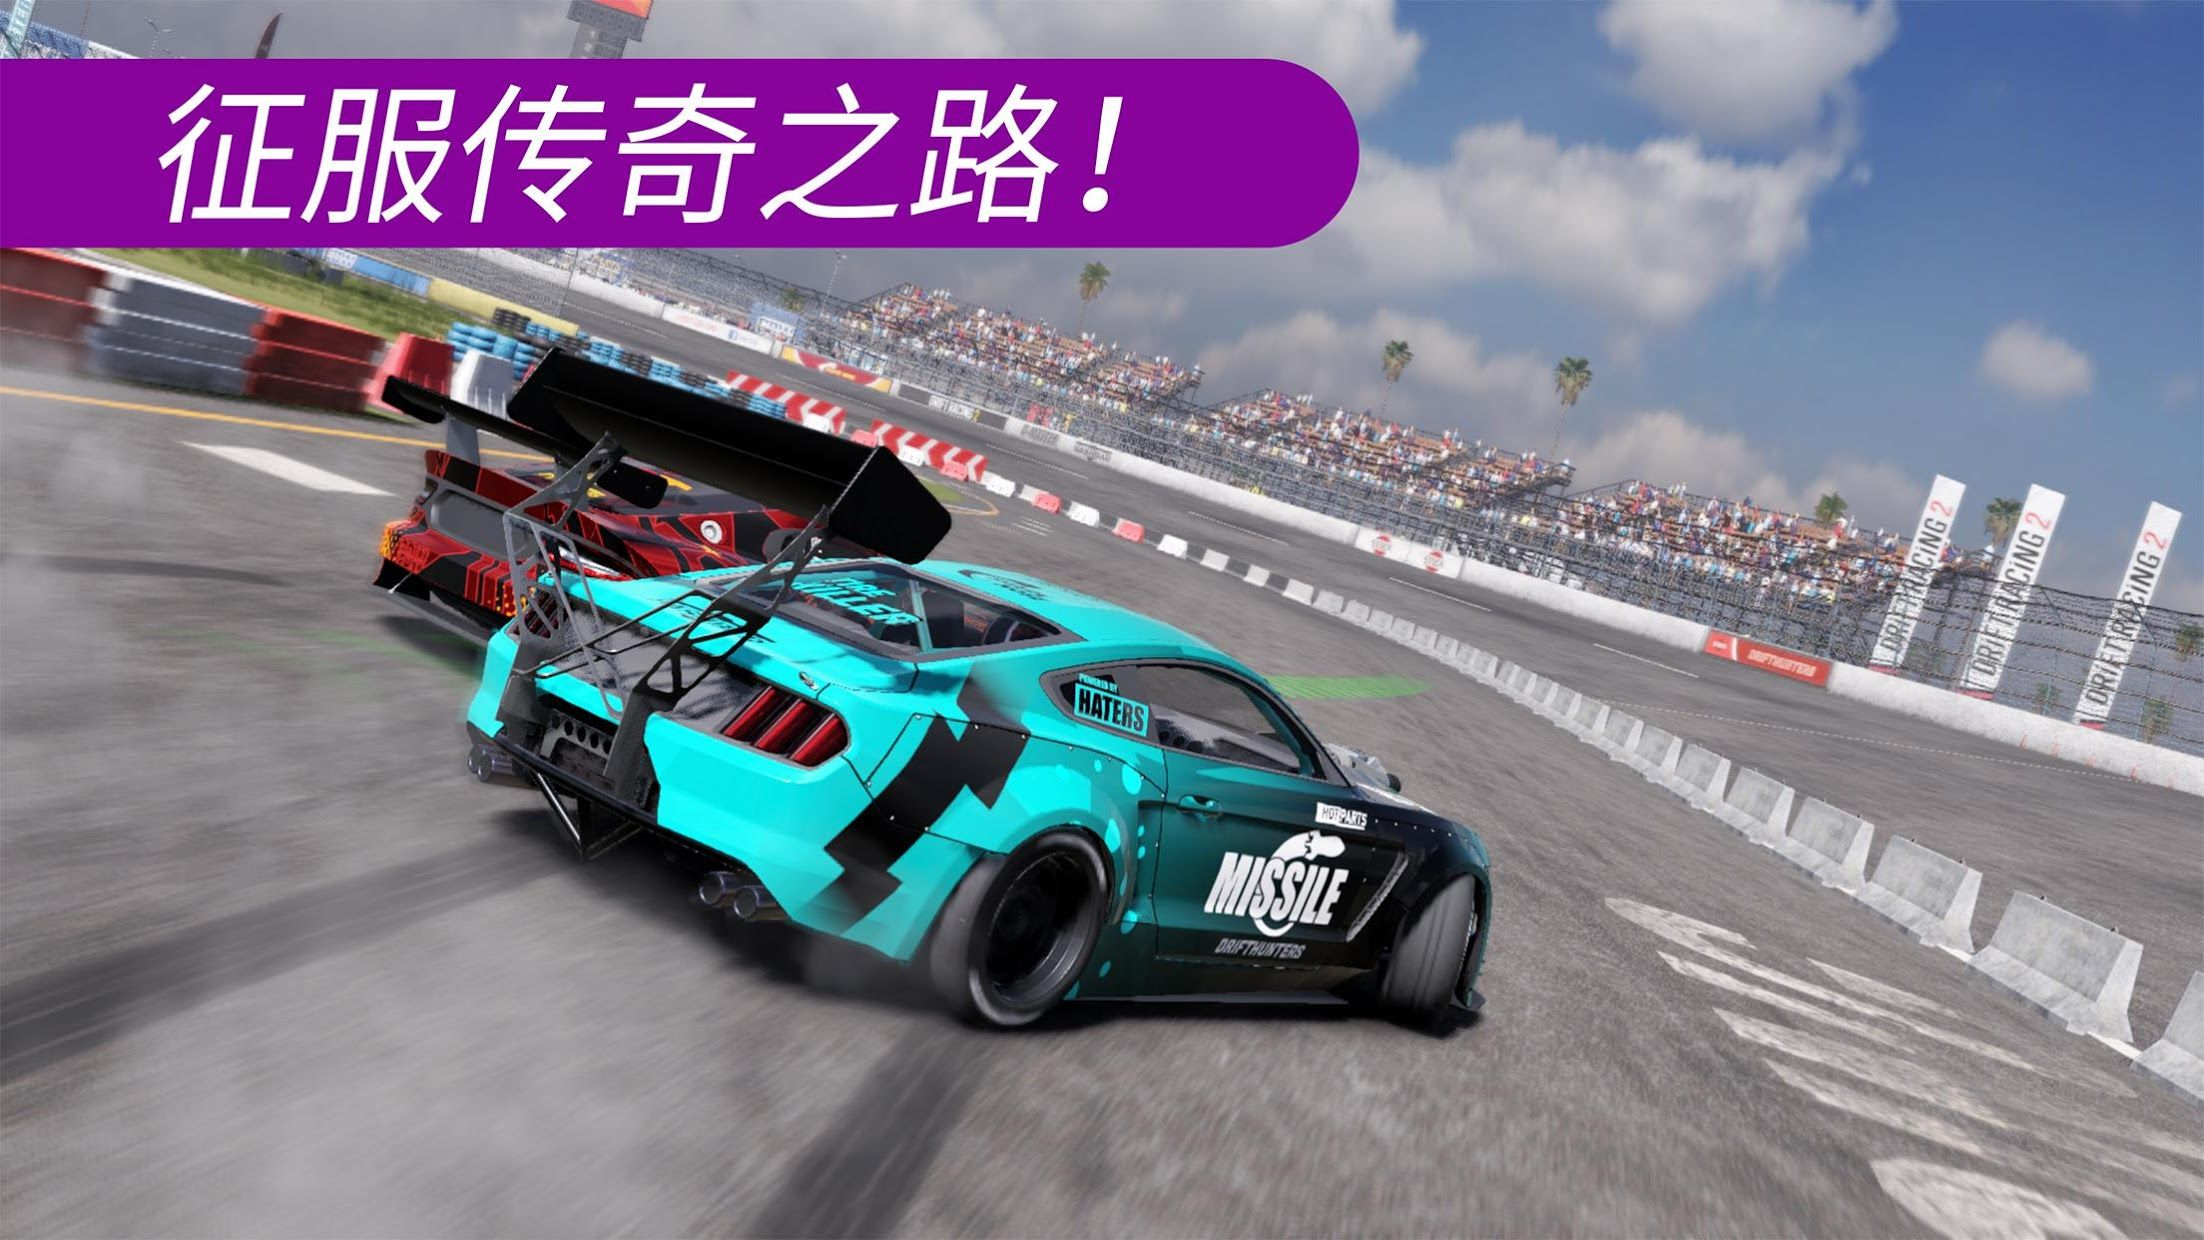 CarX 漂移赛车 2 游戏截图3